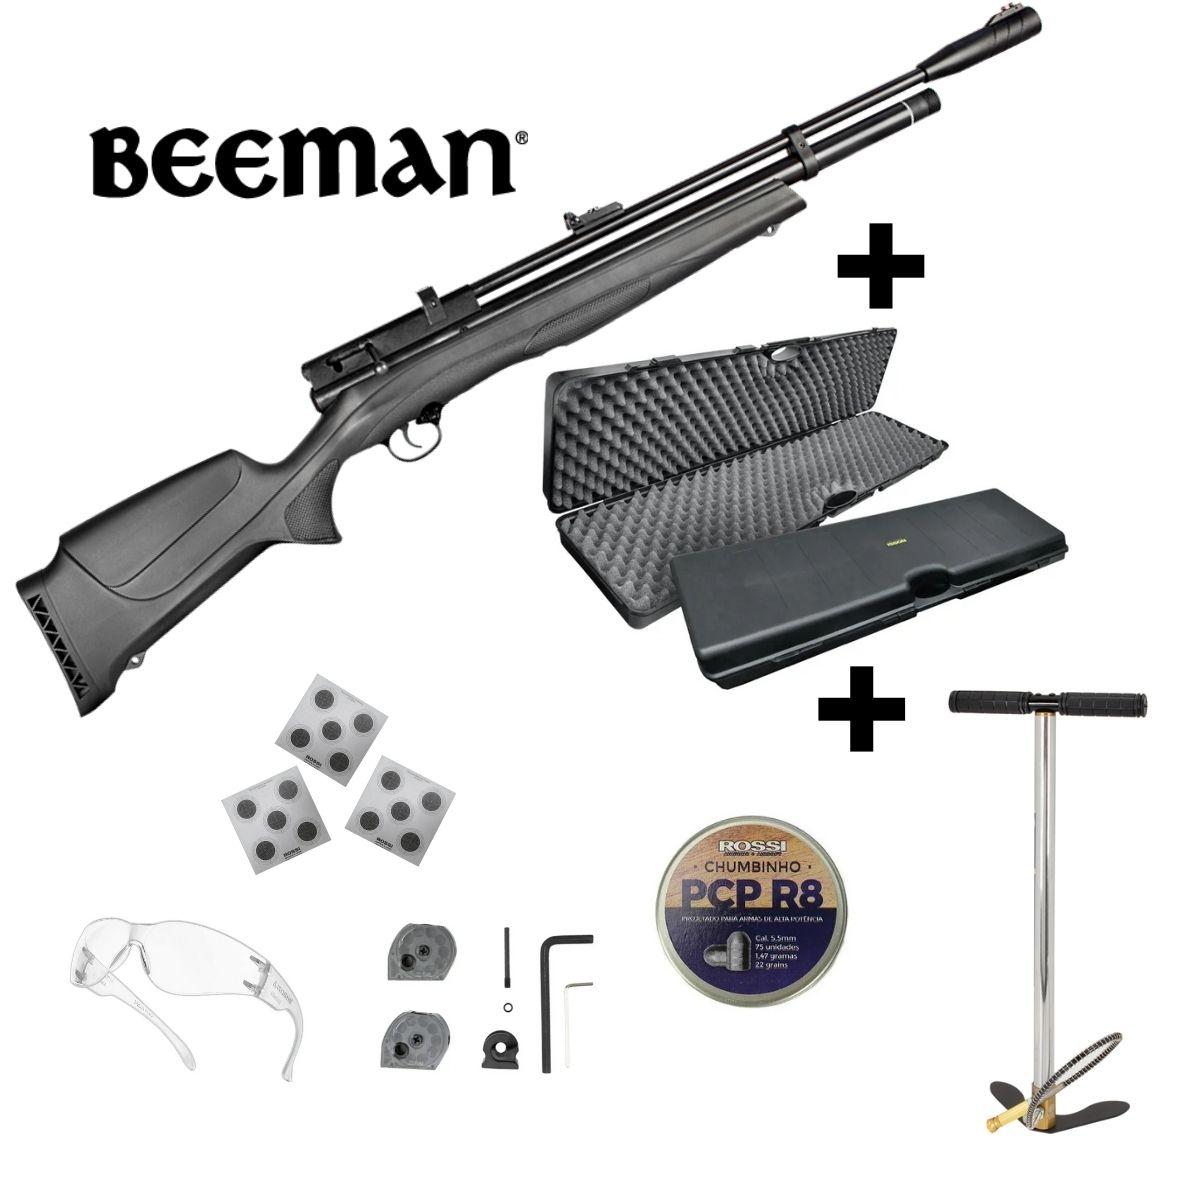 Carabina Pressão Rossi Beeman 1336 5,5mm + Kit Maleta Bomba